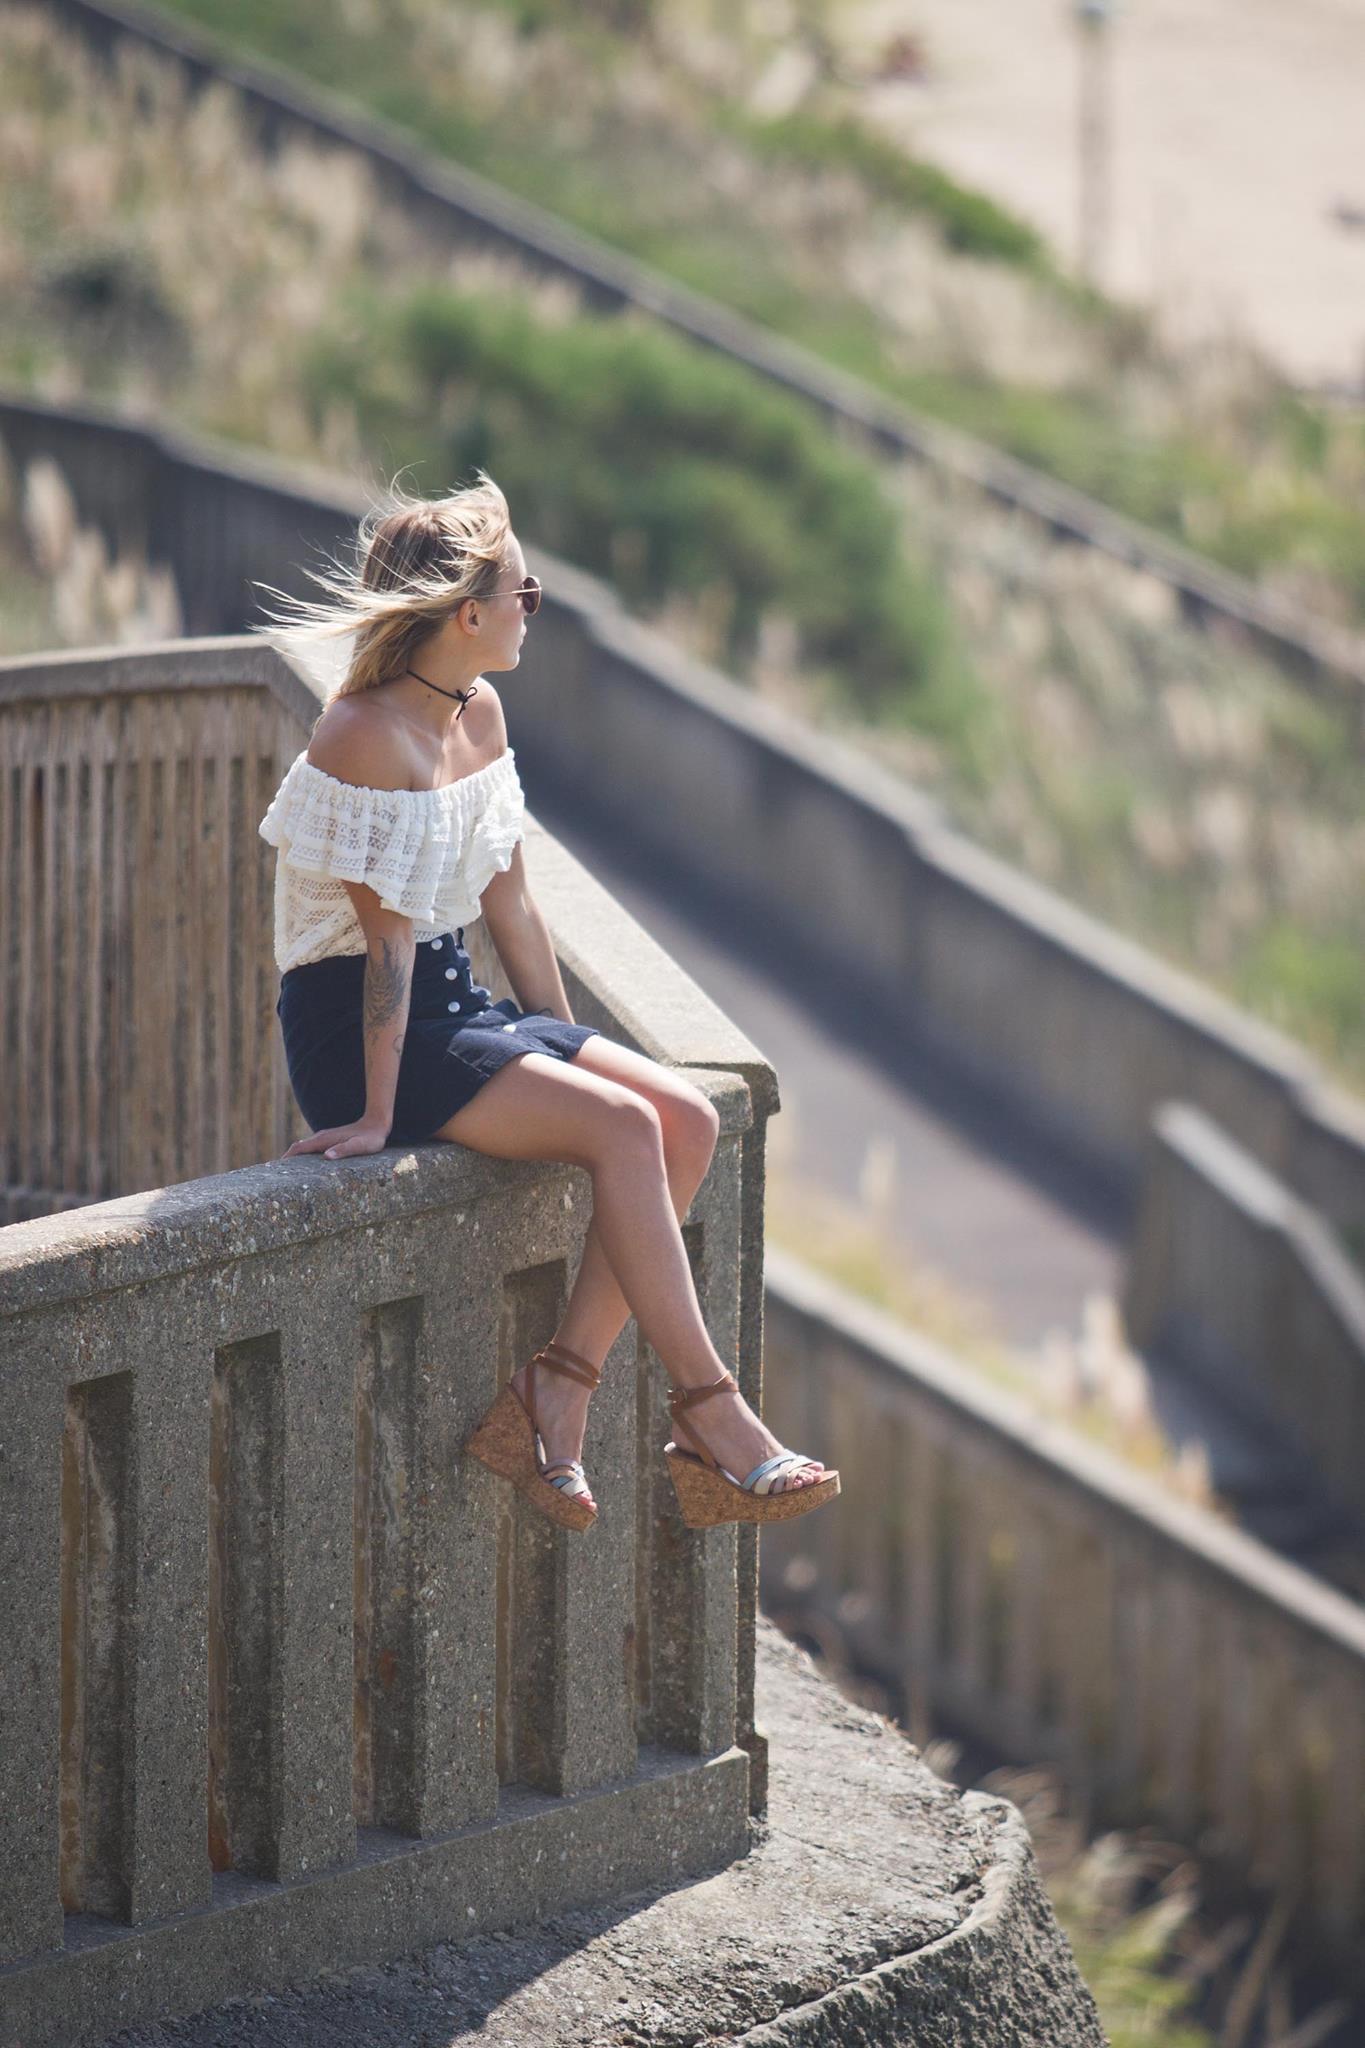 Top épaules dénudées jupe en velours et sandales Kjacques I Sp4nkblog 3